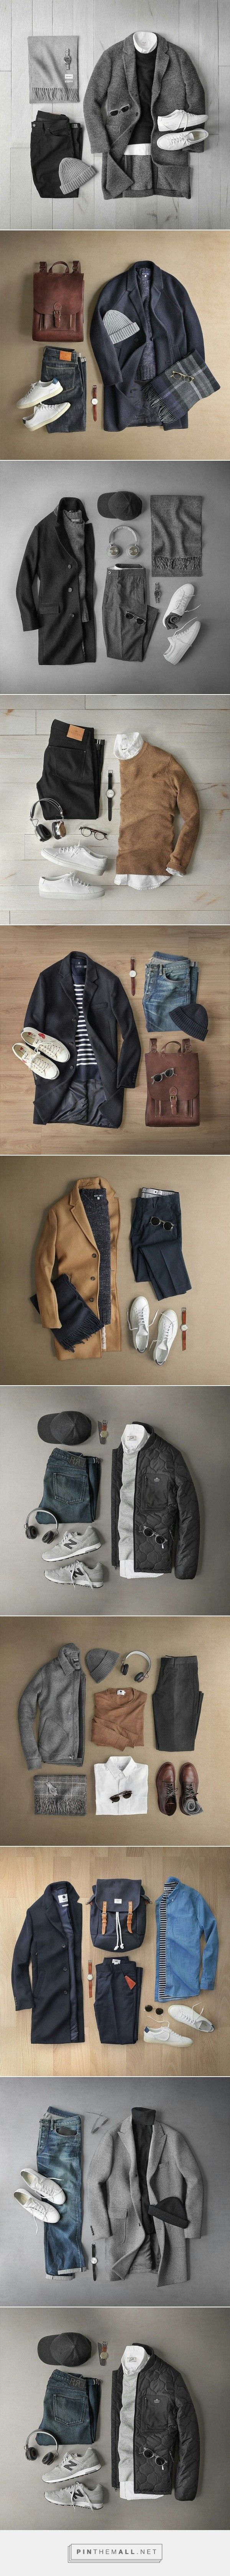 Winter Outfit Formulas For Men #mensfashion #fashion